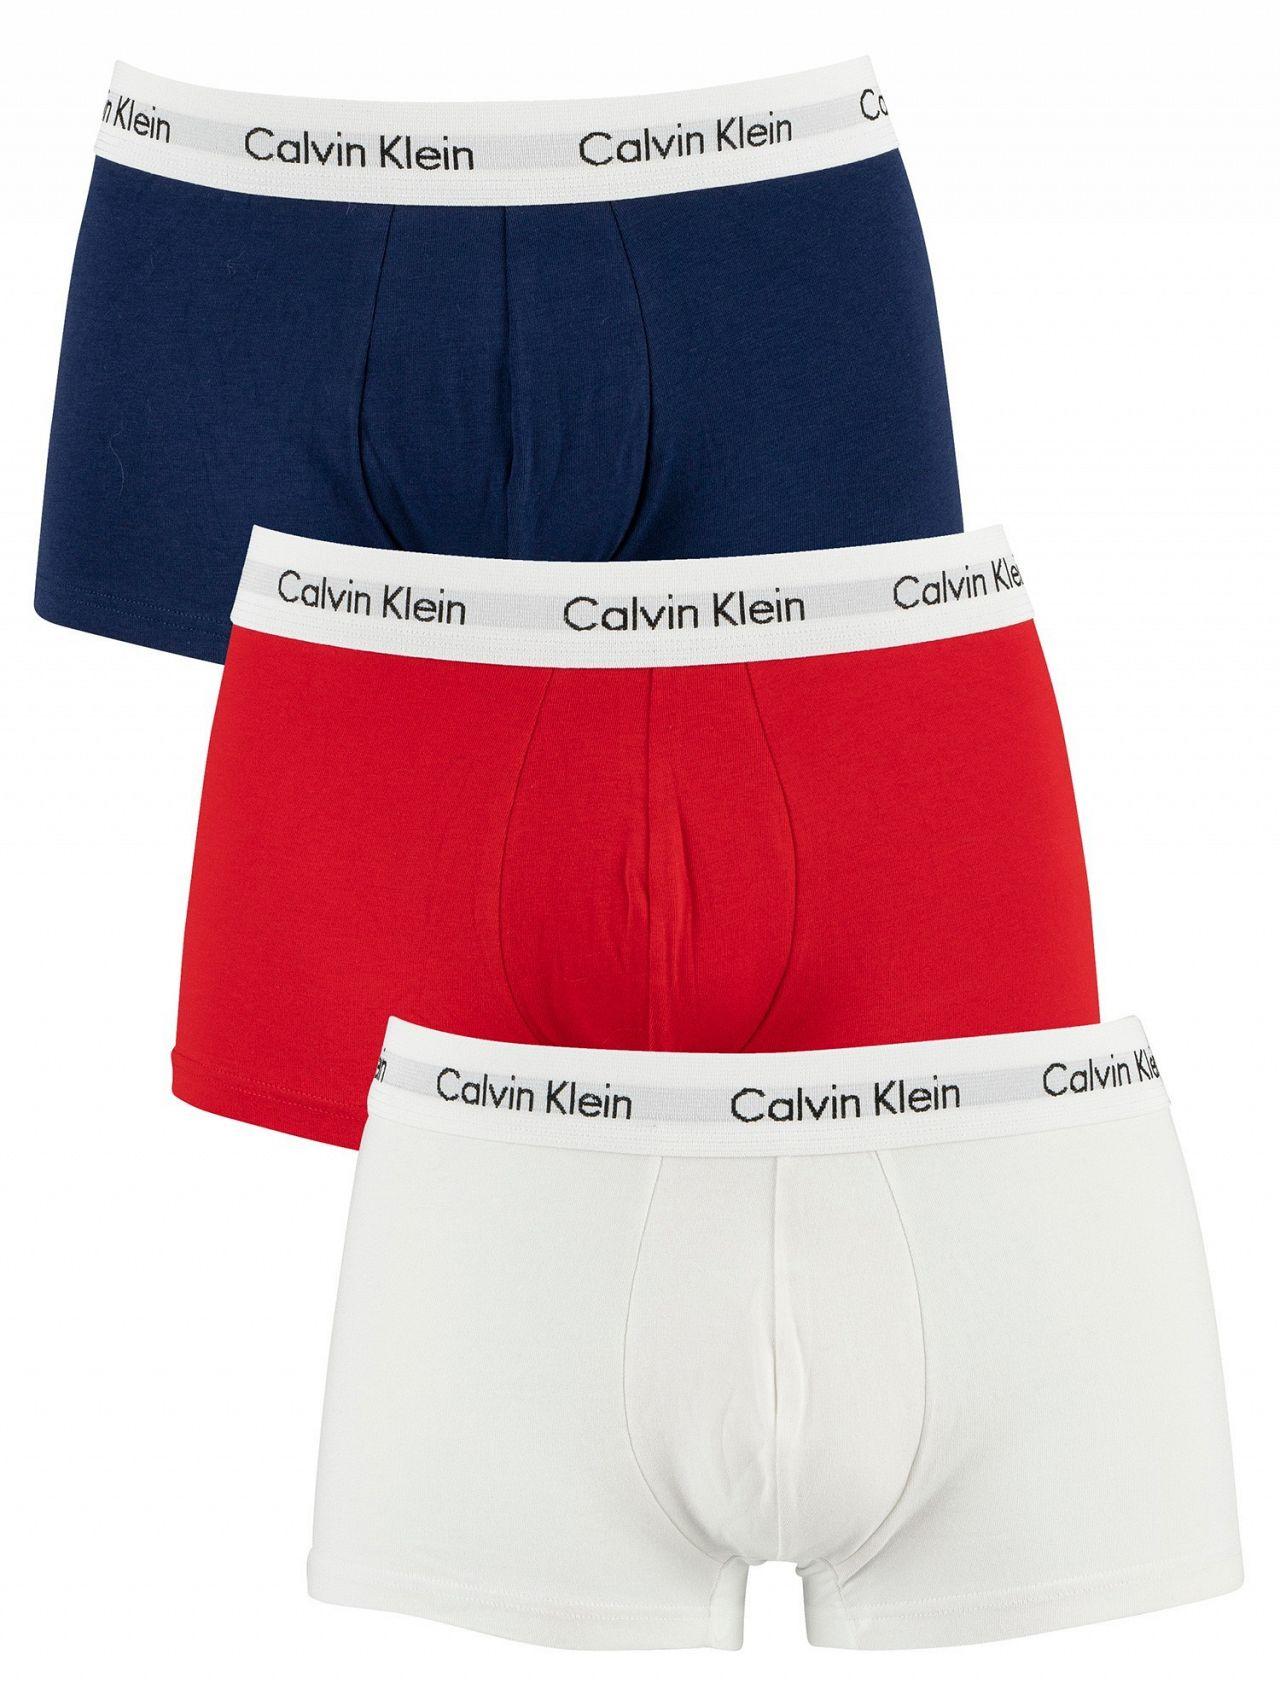 d1d35e878 Calvin Klein White/Red Ginger/Pyro Blue 3 Pack Low Rise Trunks ...